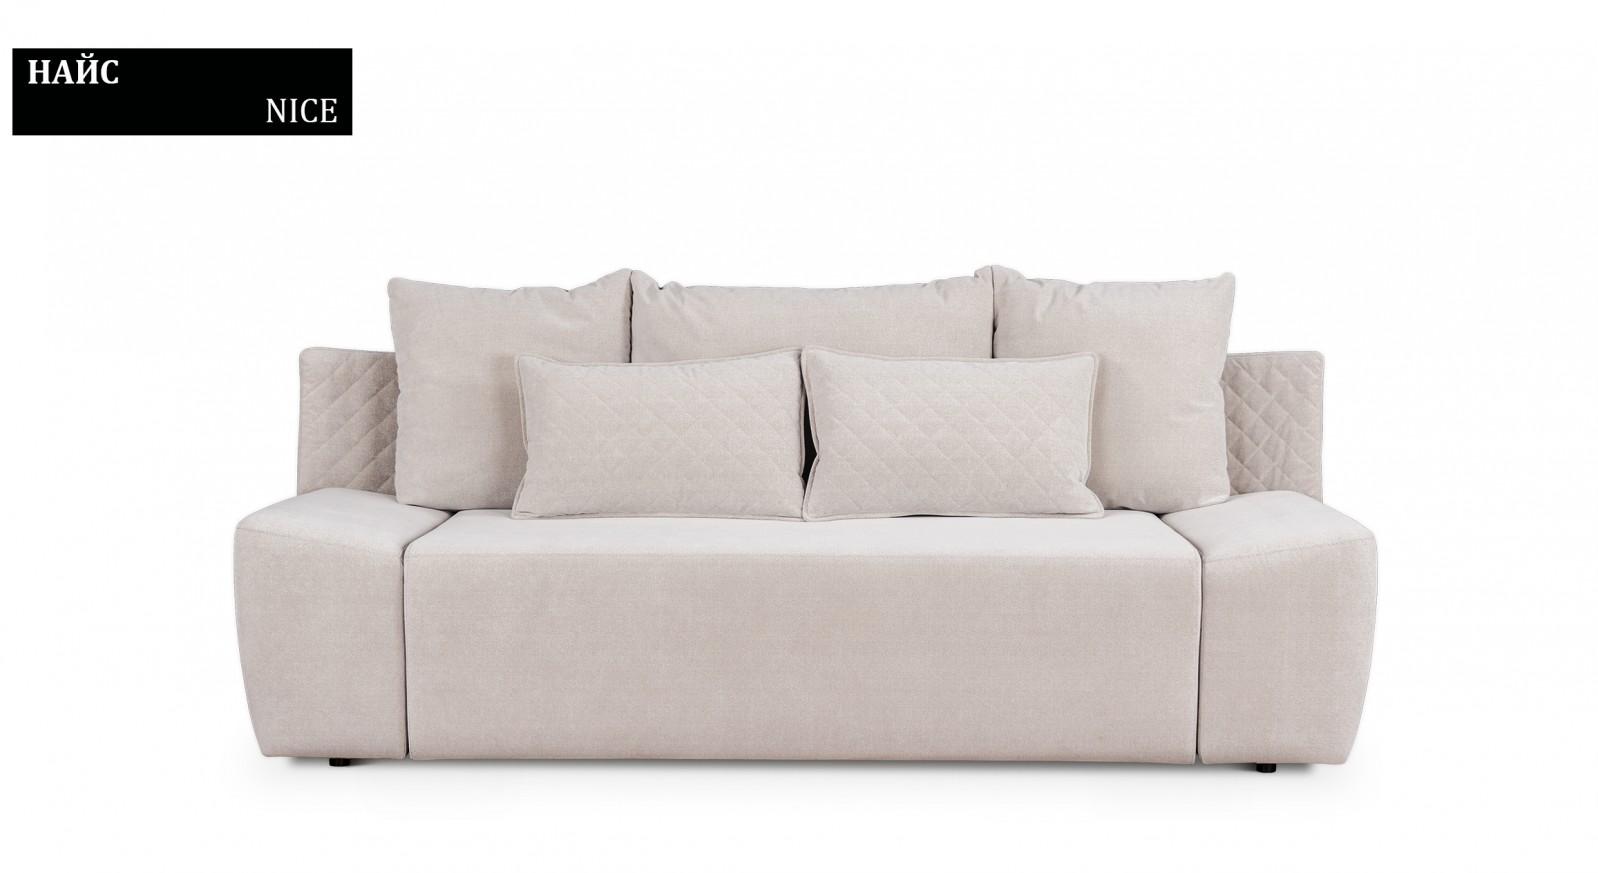 Nice Sofa : Sofa